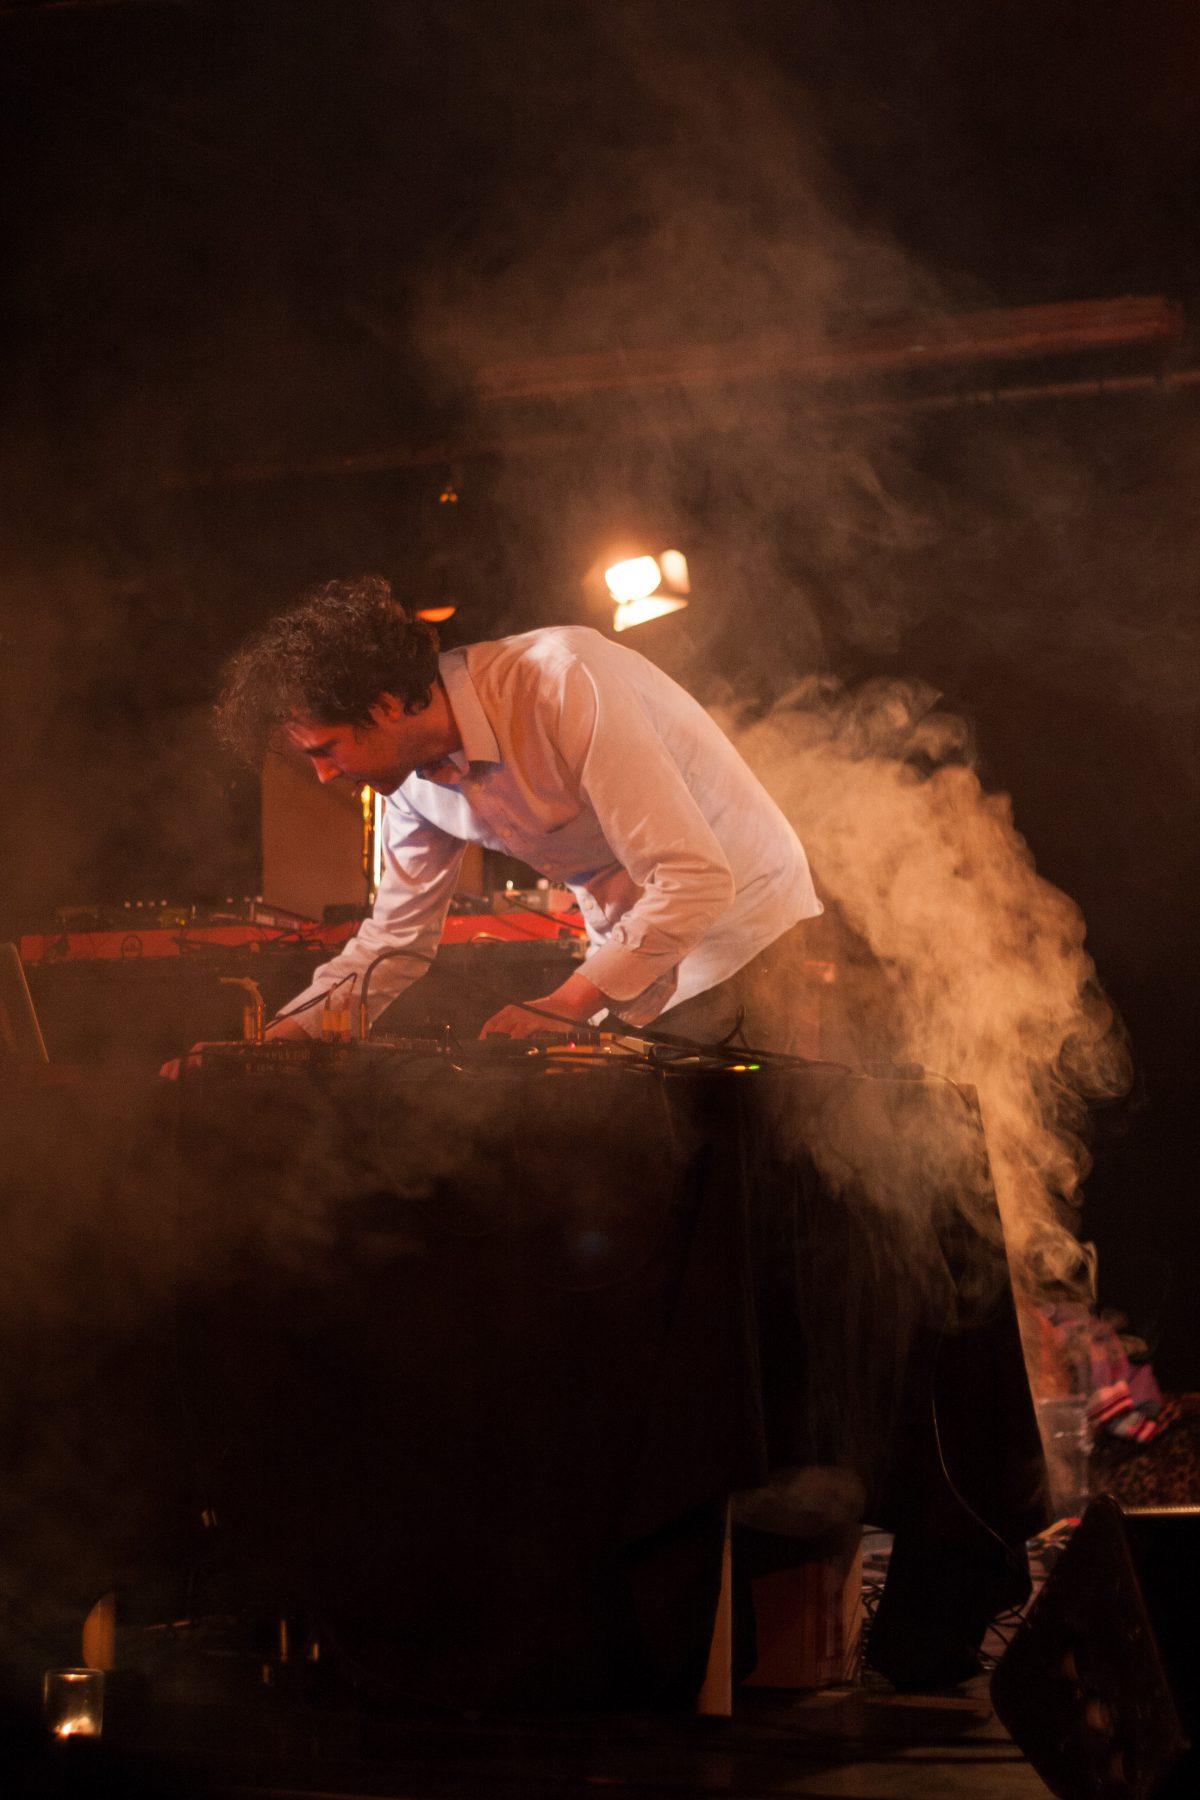 Umberto, gig, music